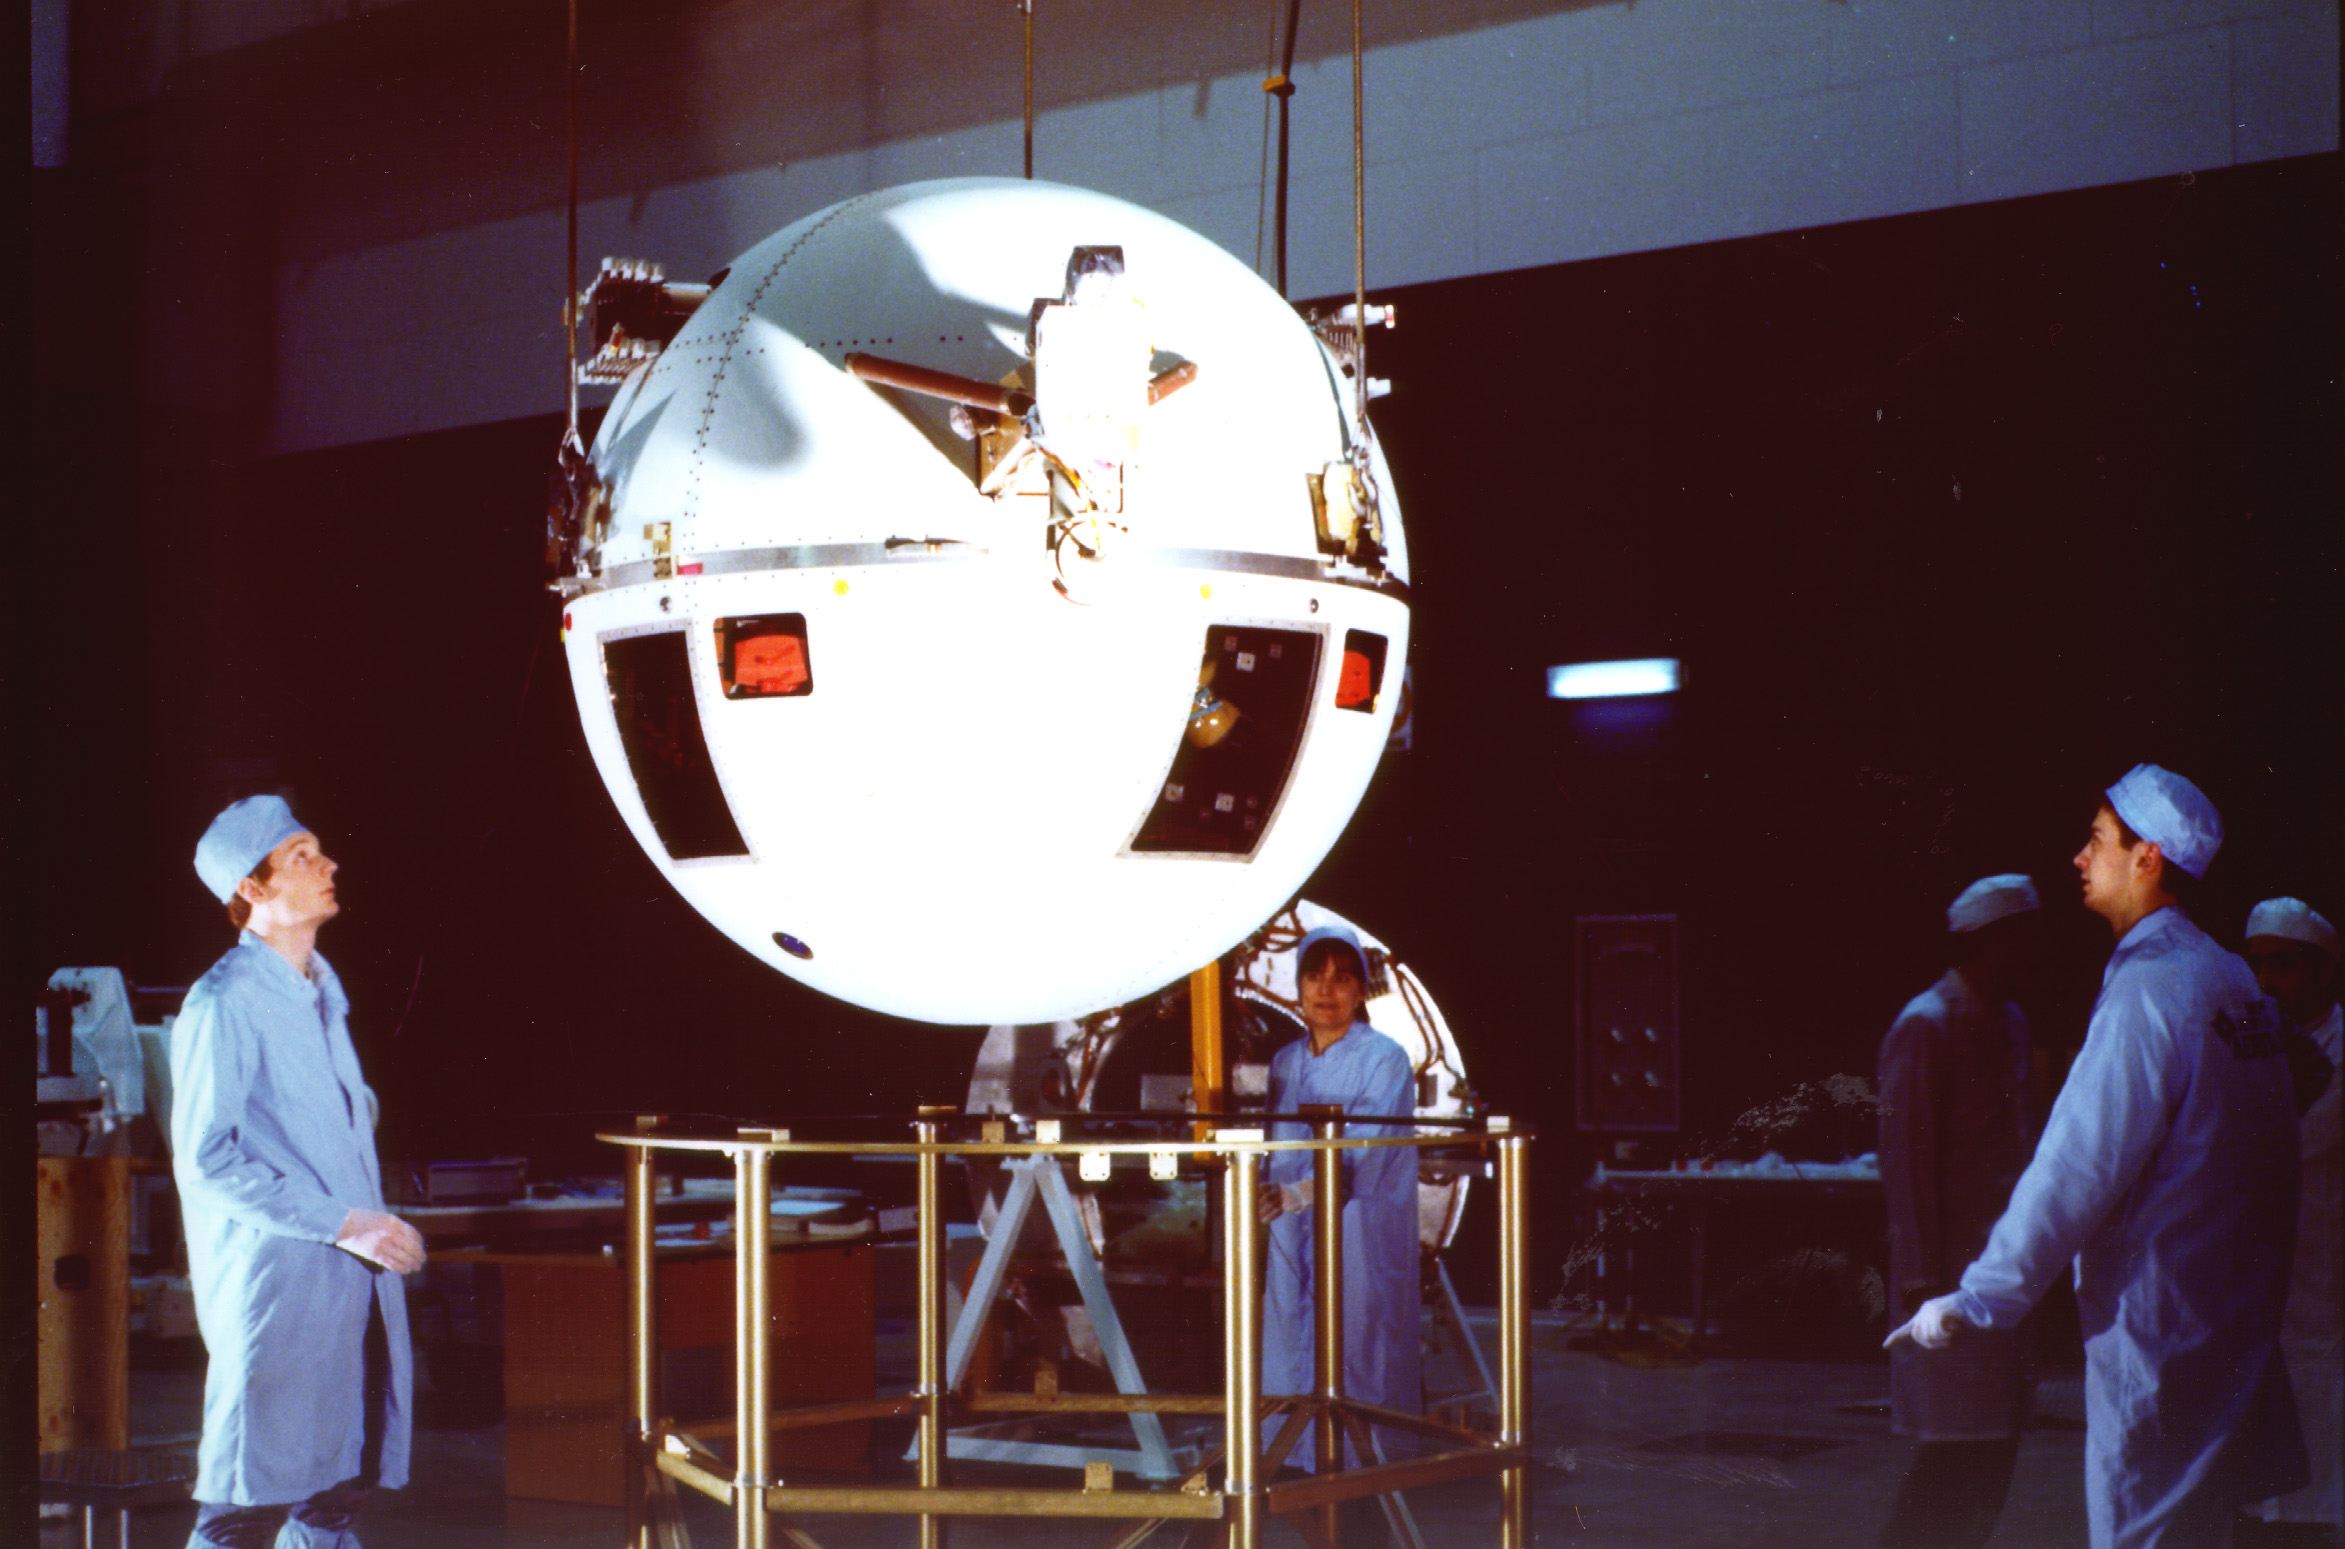 ASI - Tethered Satellite System (TSS-1 e TSS-1R)